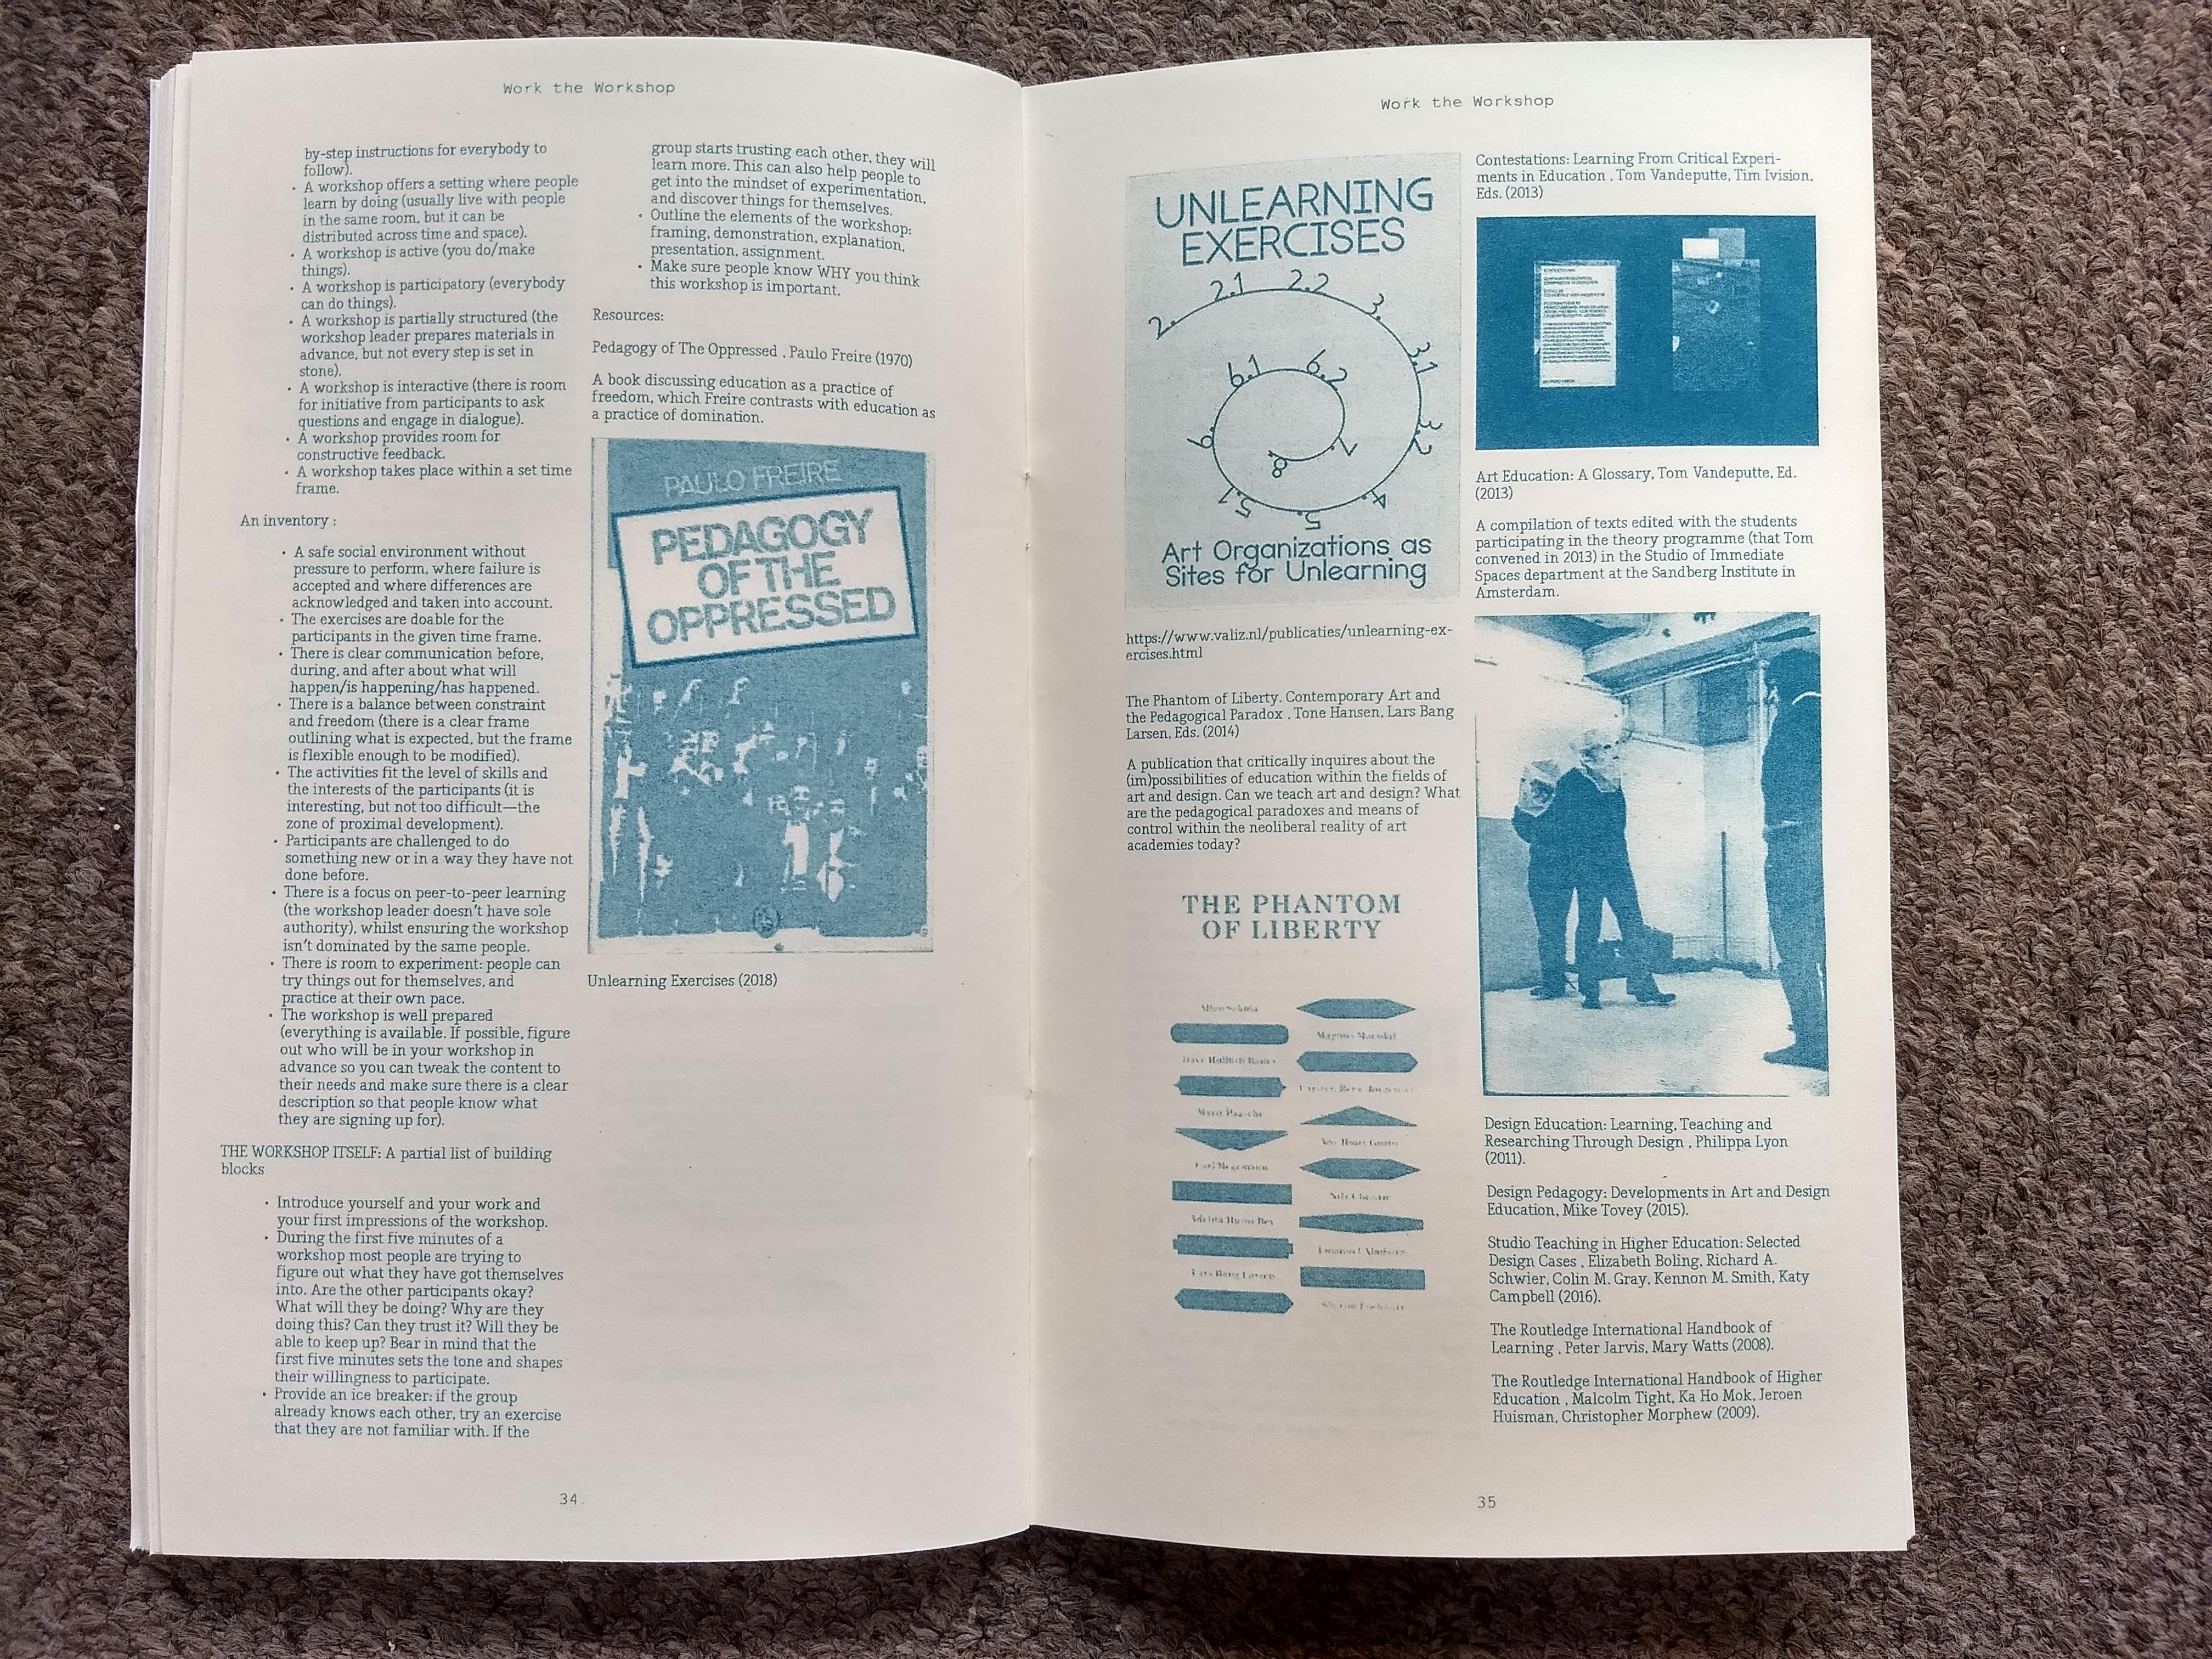 FlaskApp/static/images/samples-of-work/publications/hnd-fake-it11.jpg